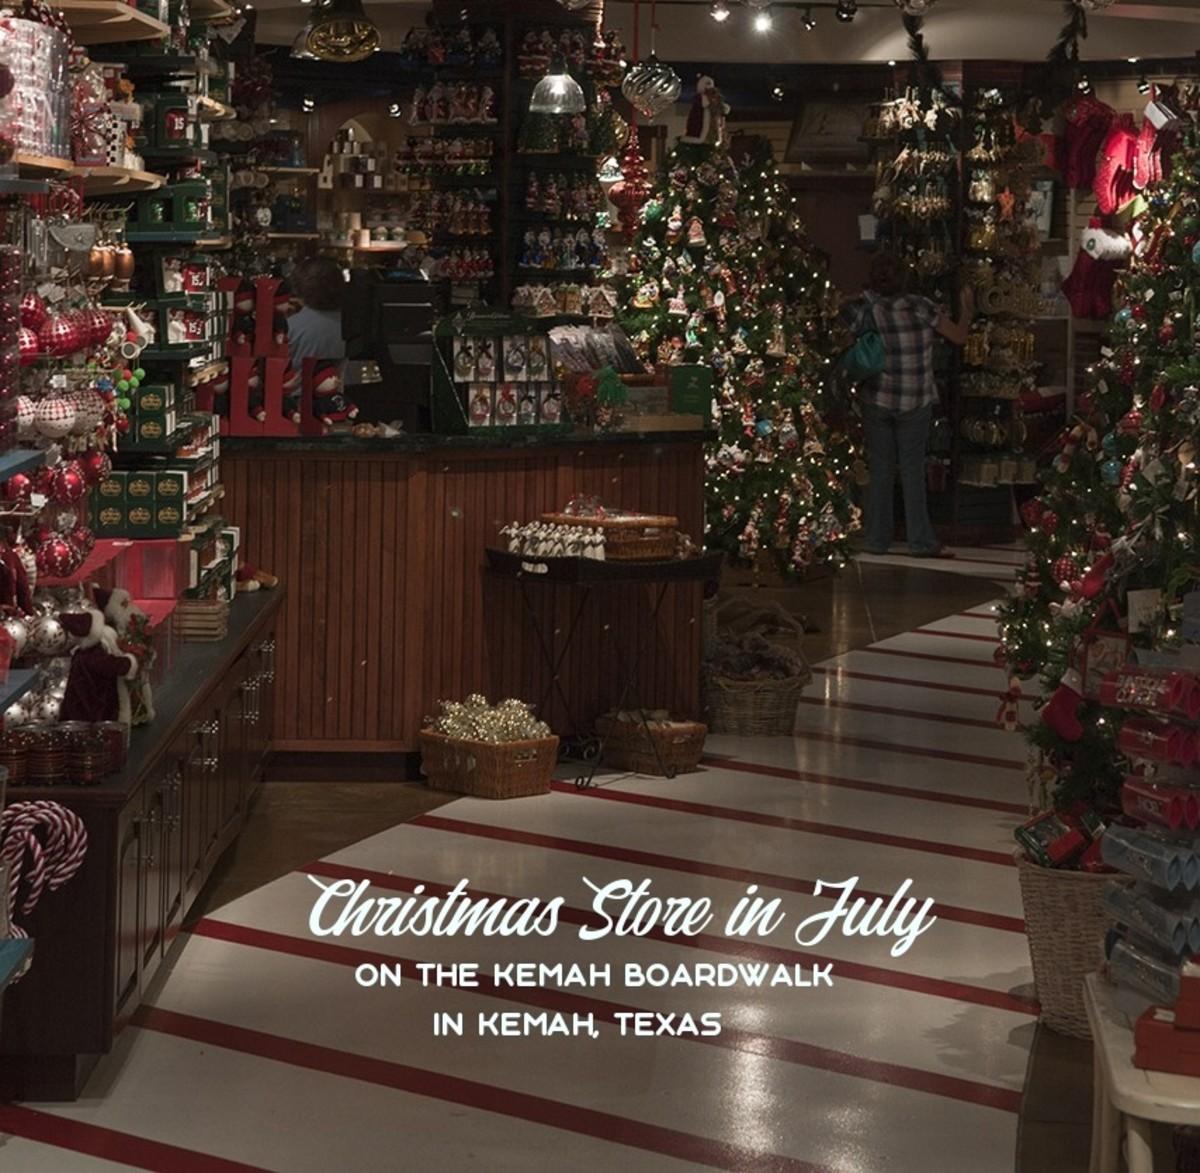 Christmas Store in July, in Kemah, Texas